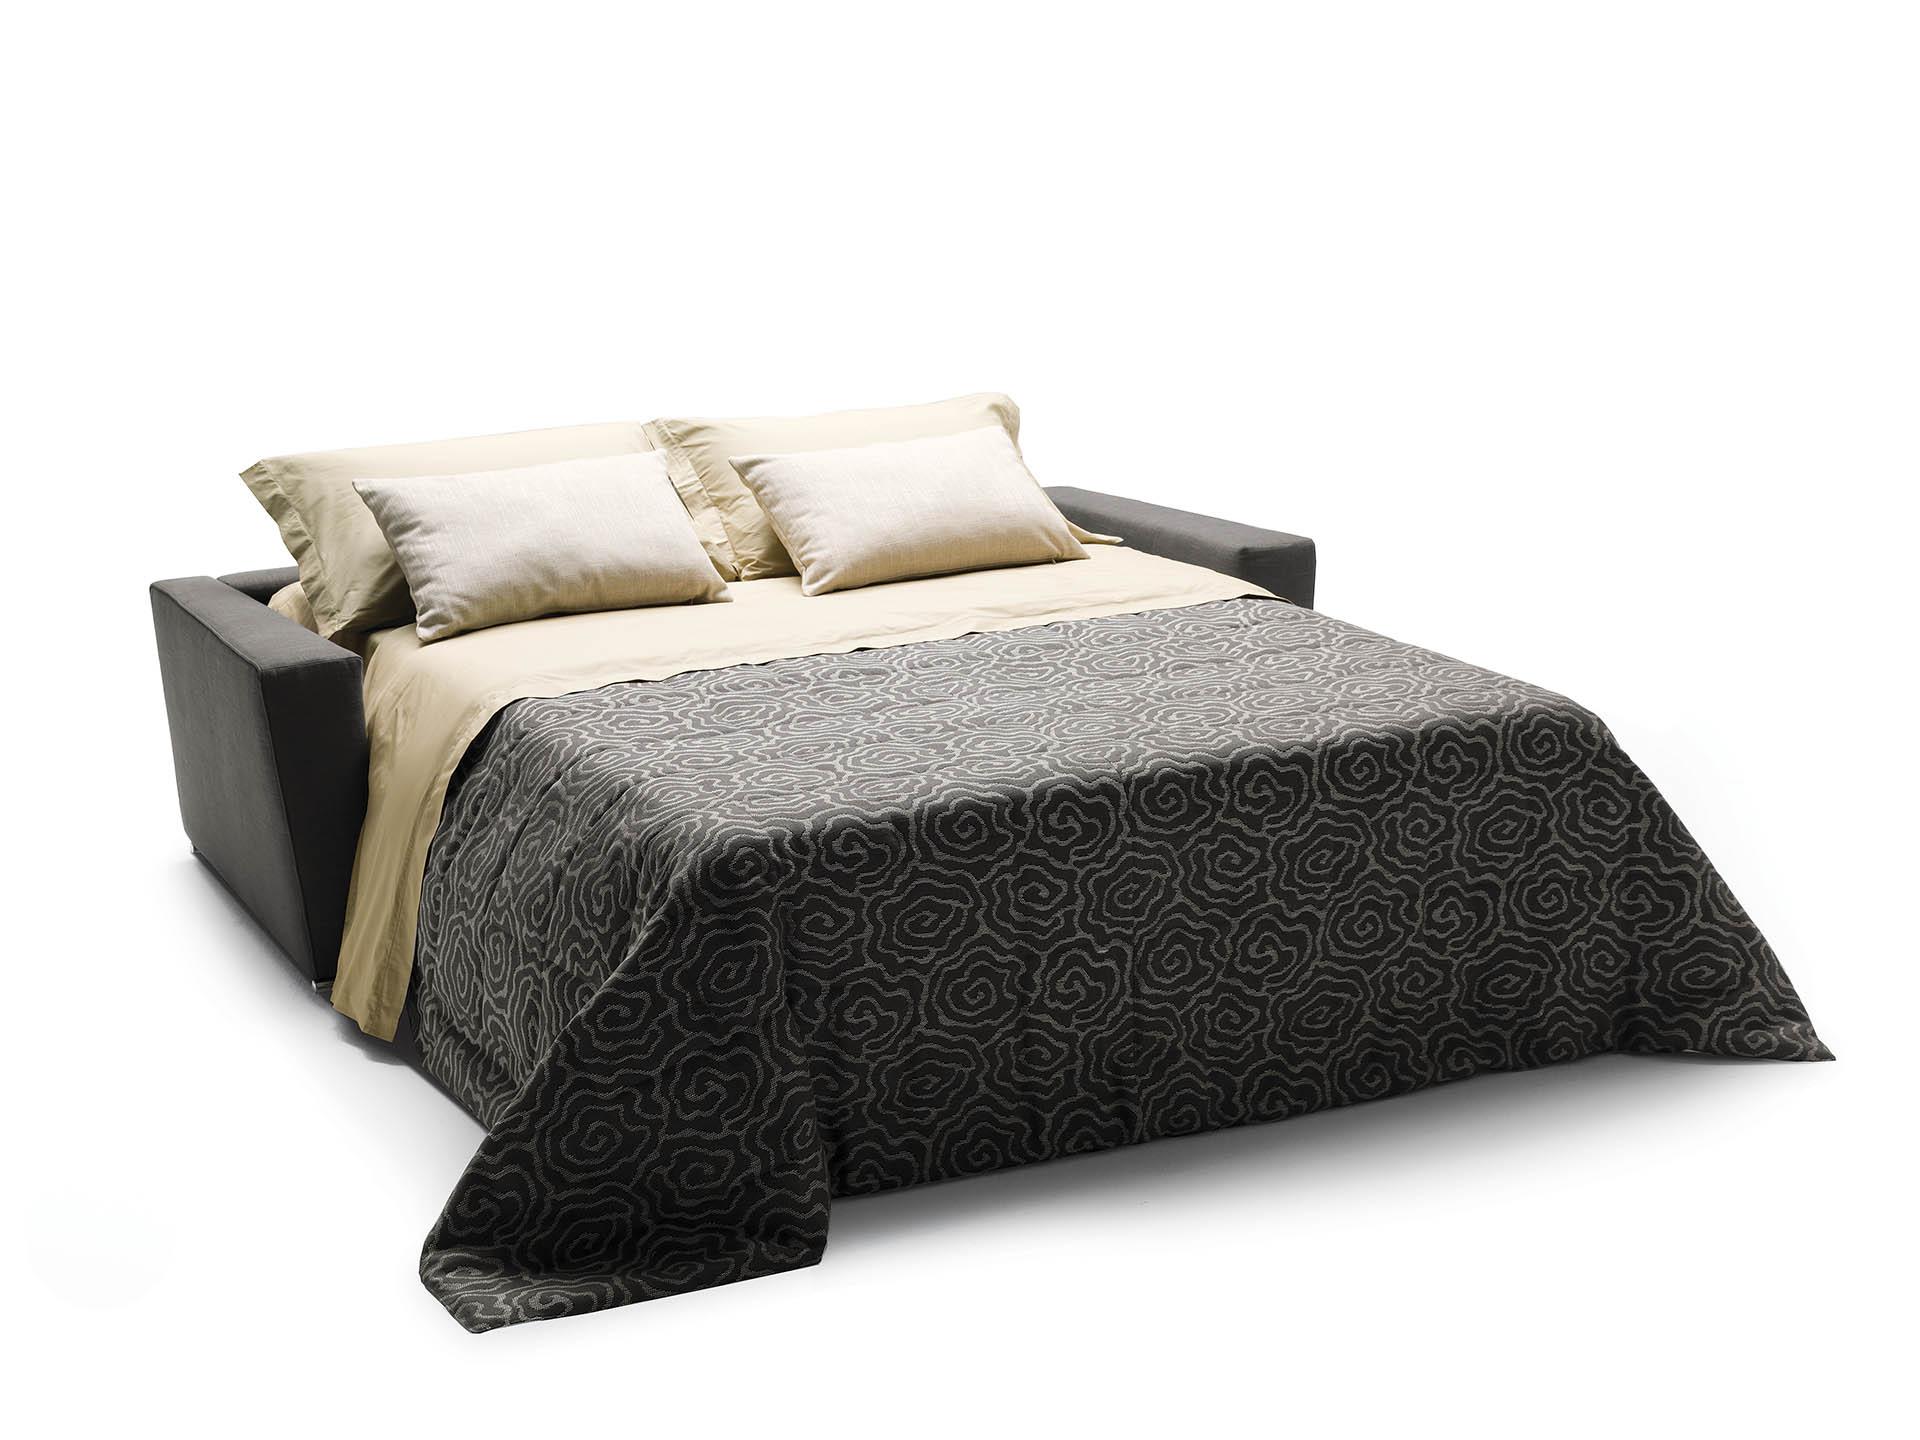 milano bedding divano letto shorter. Black Bedroom Furniture Sets. Home Design Ideas